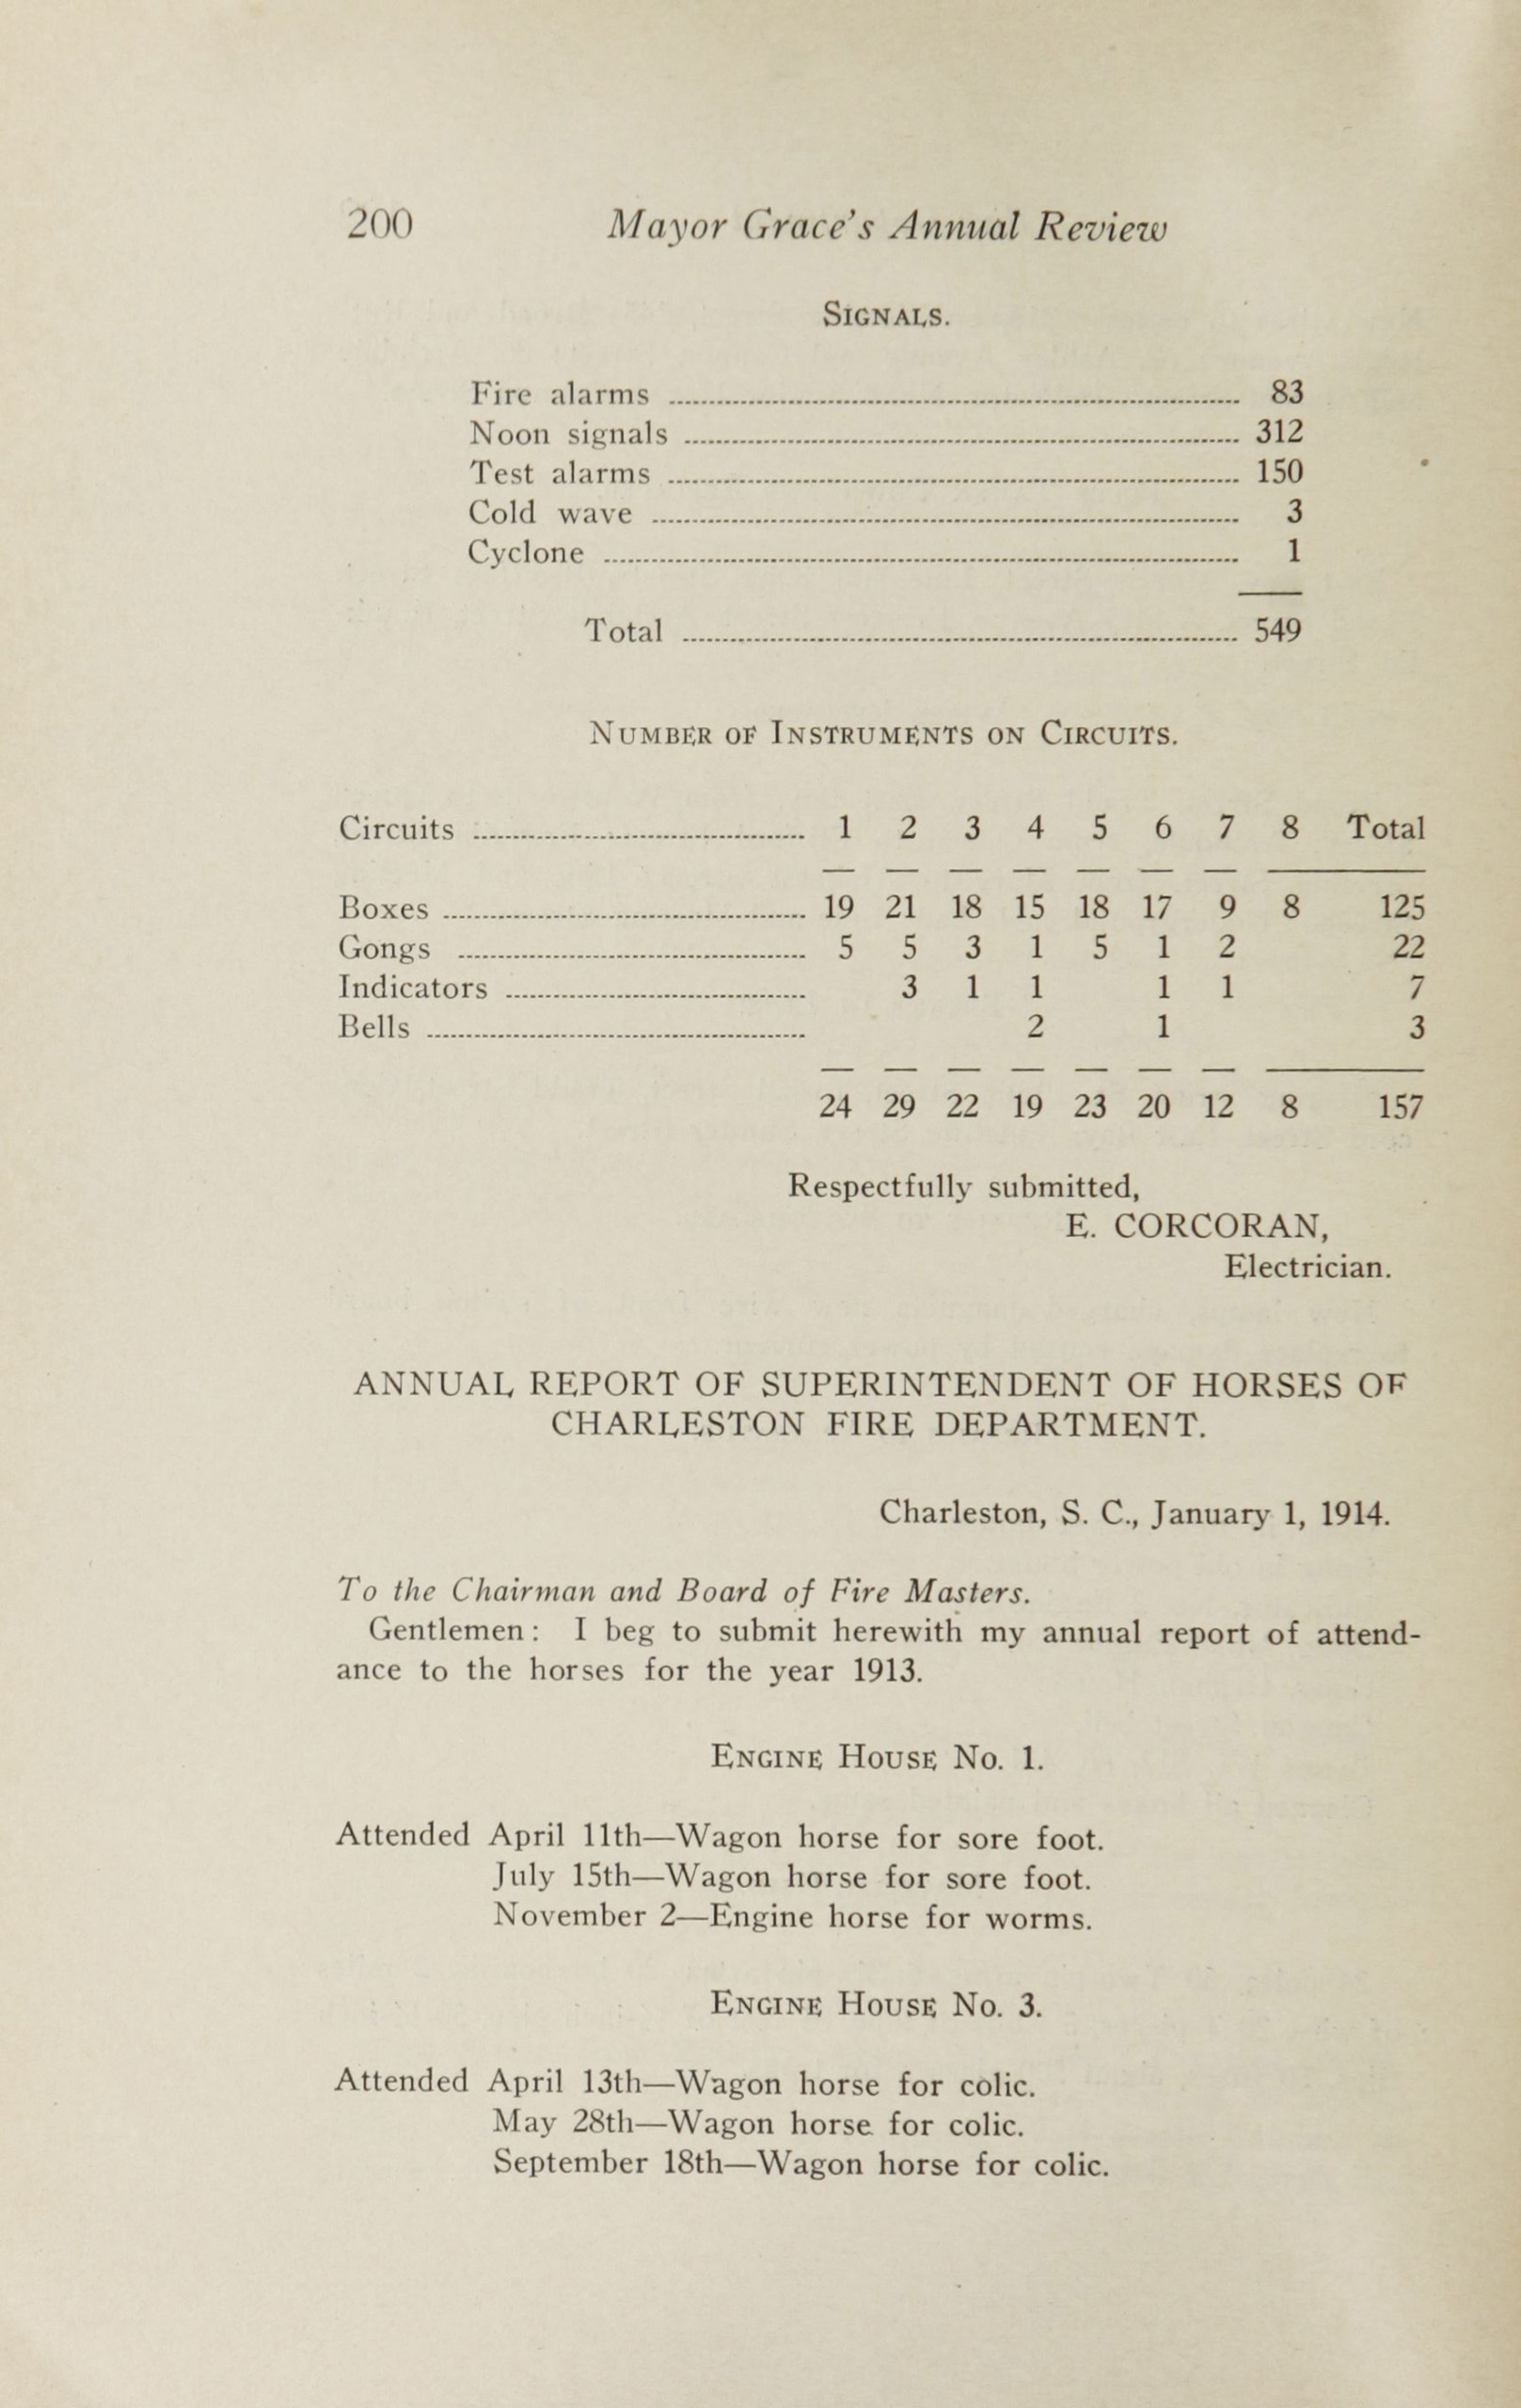 Charleston Yearbook, 1913, page 200